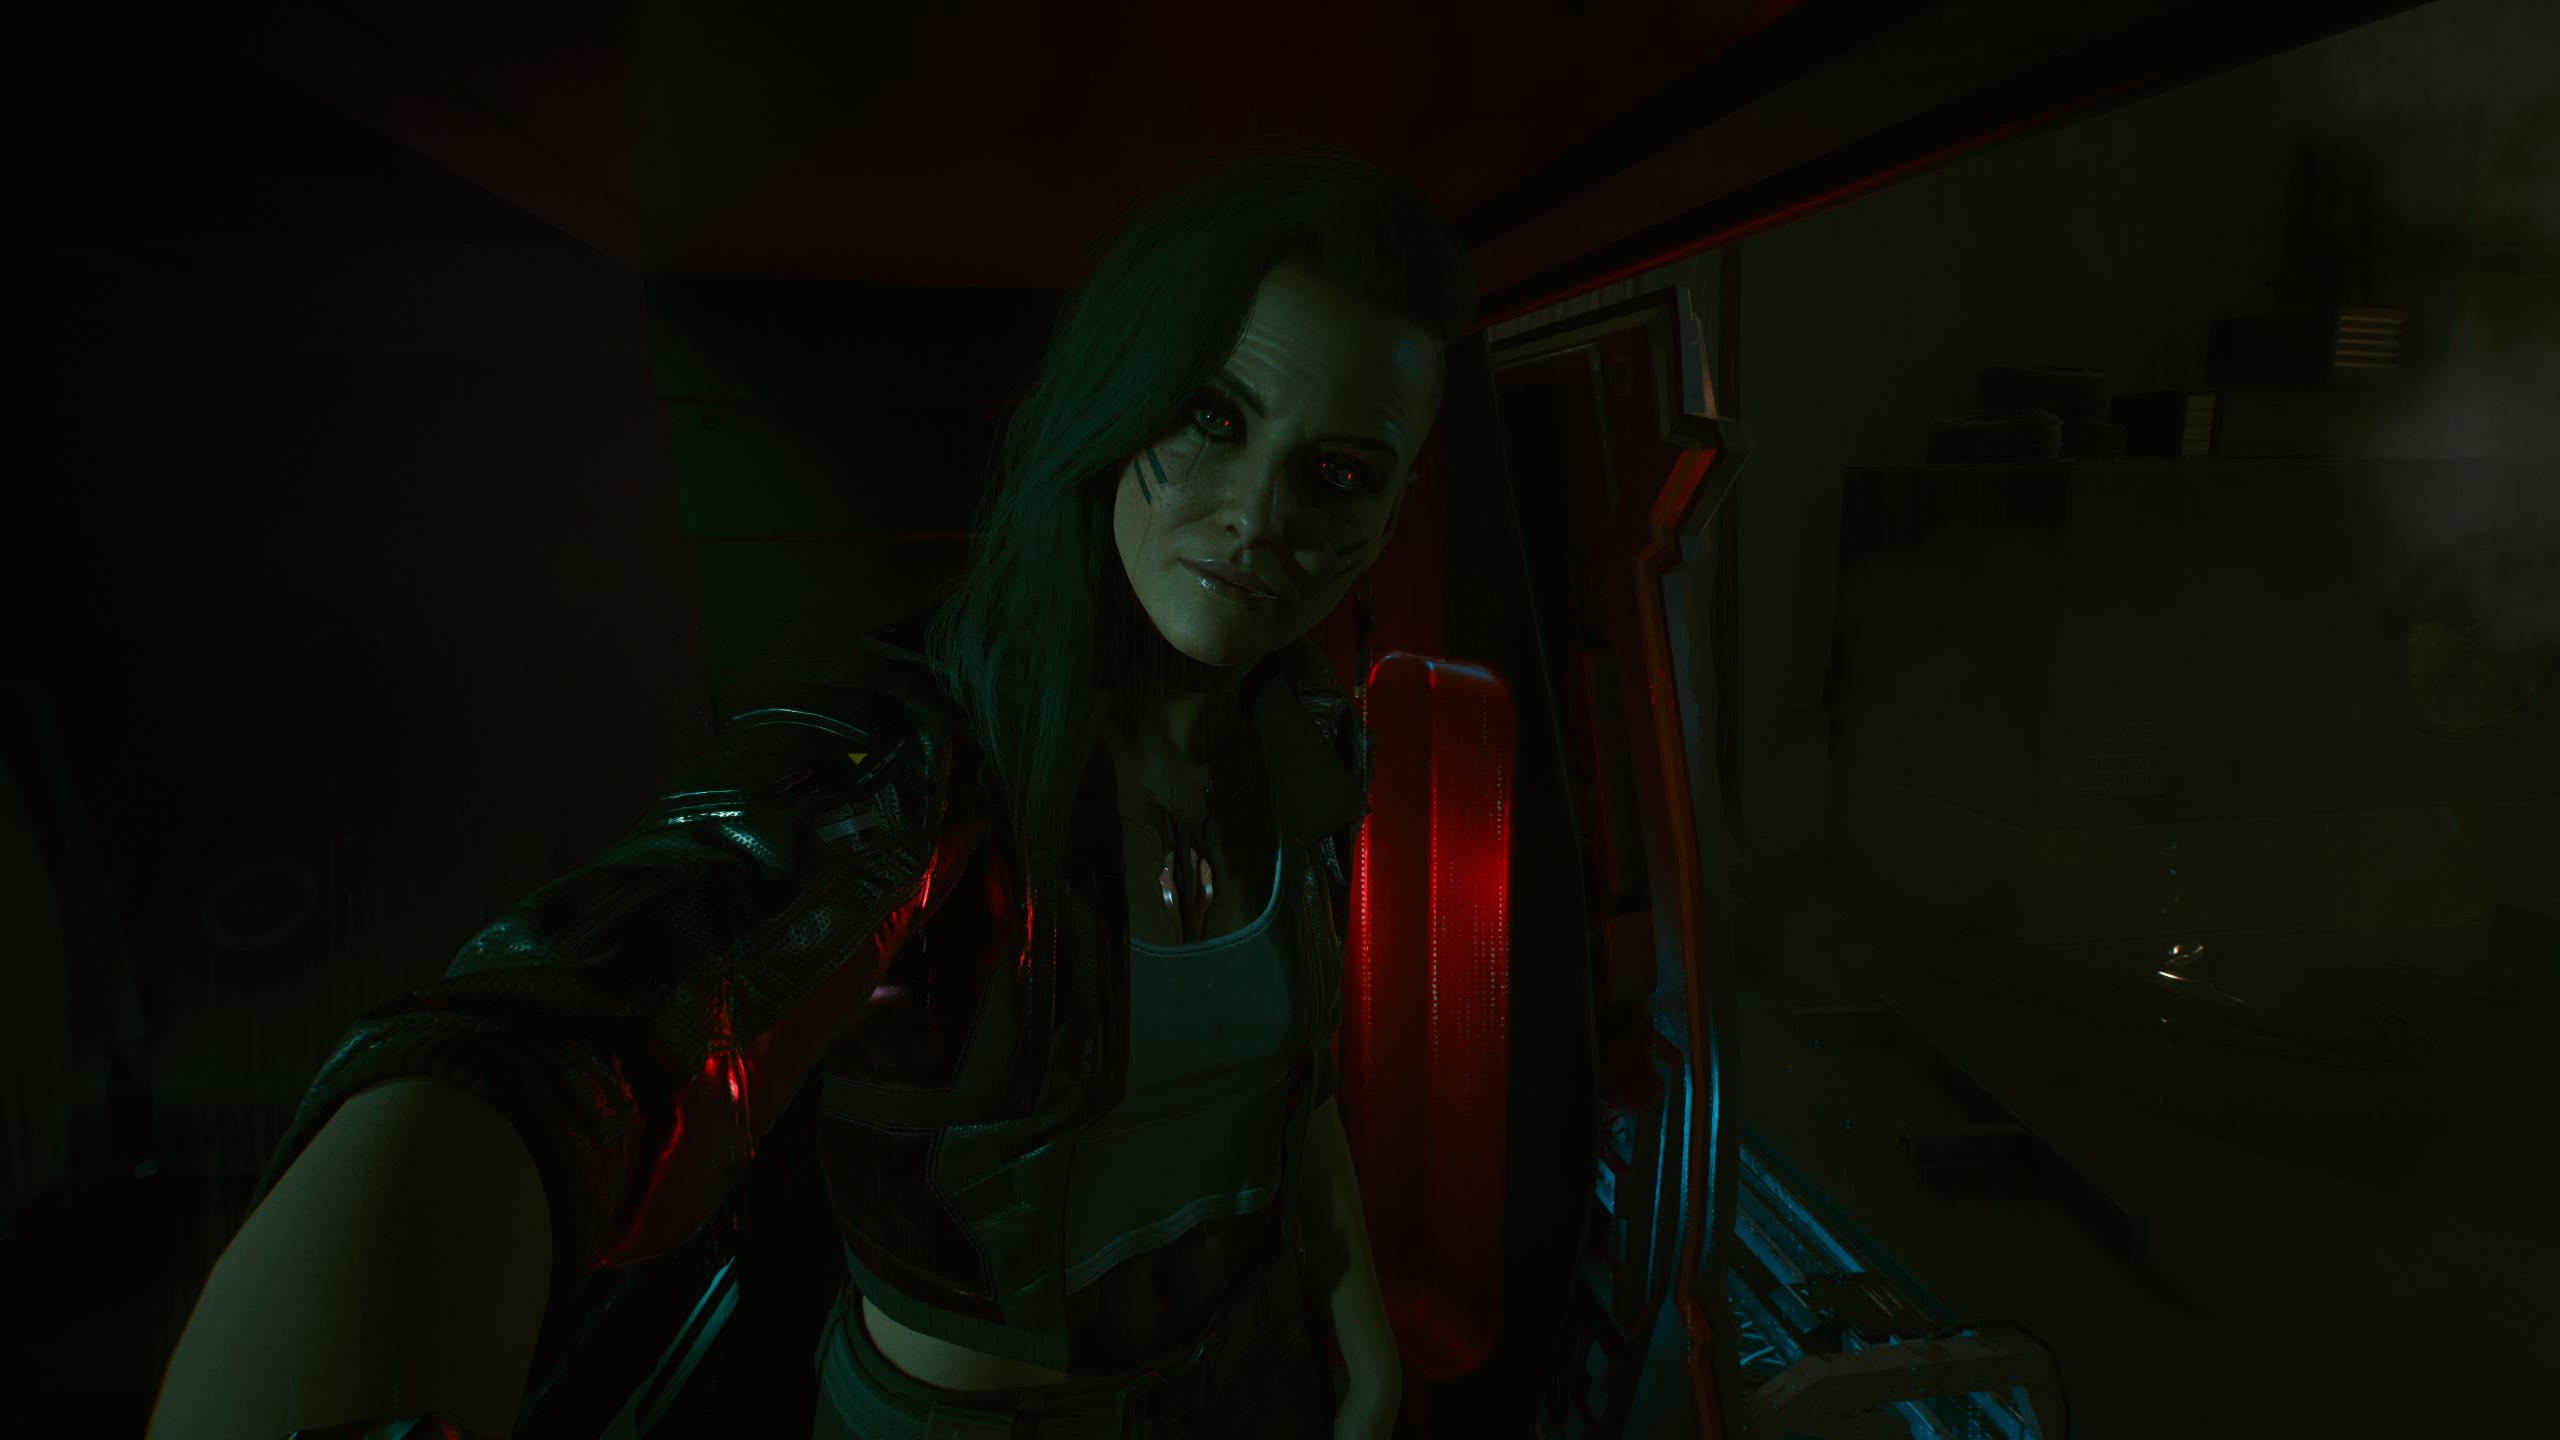 Бестия - Cyberpunk 2077